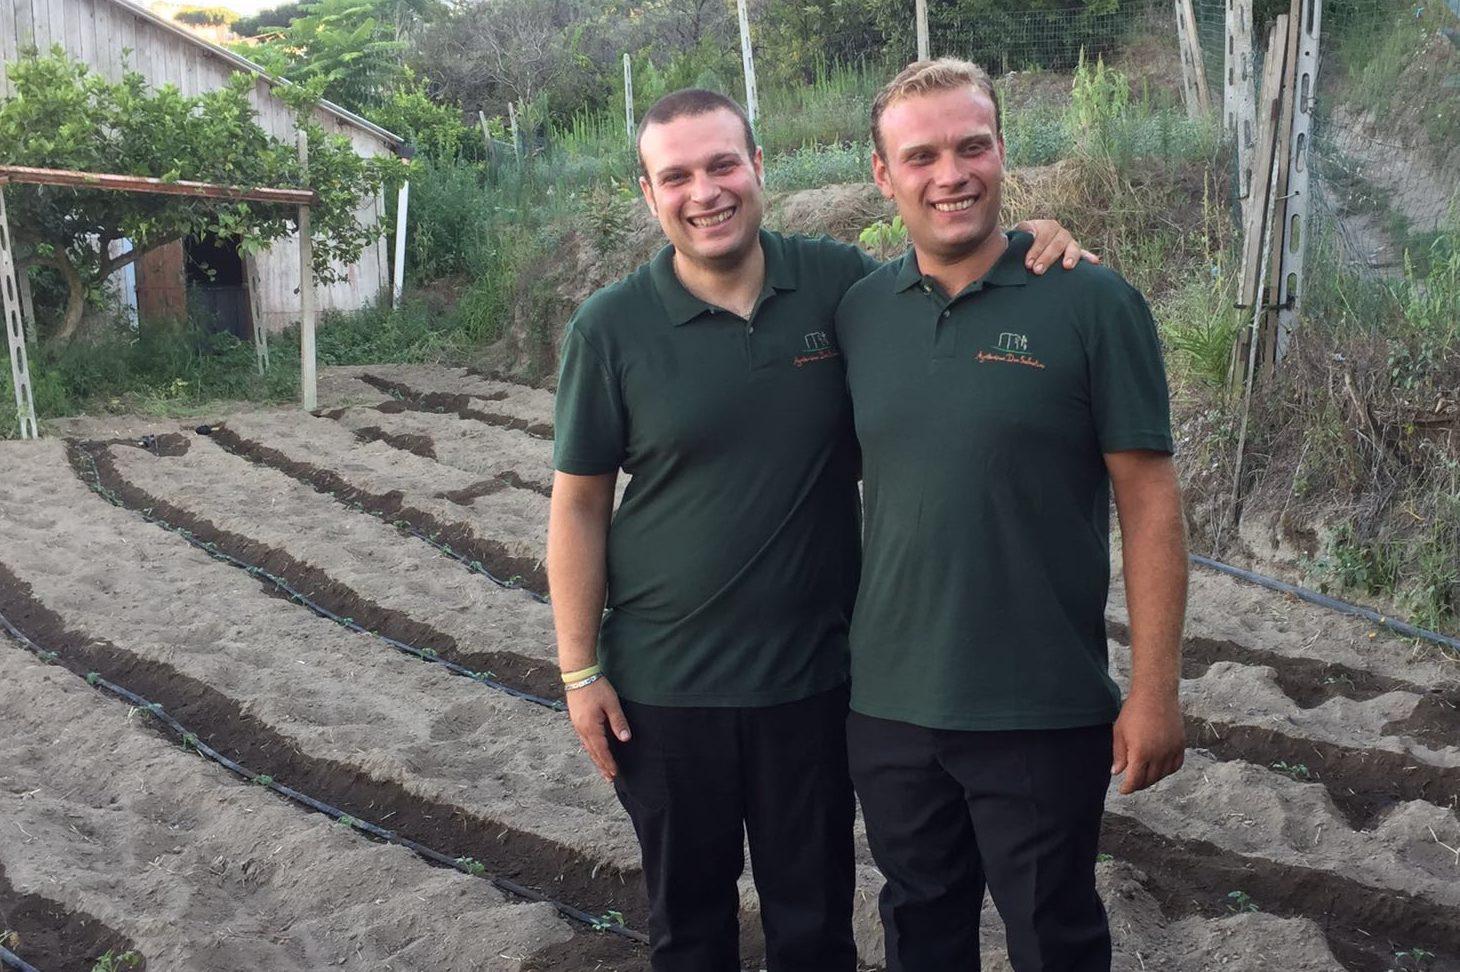 I fratelli Luigi e Generoso Colandrea